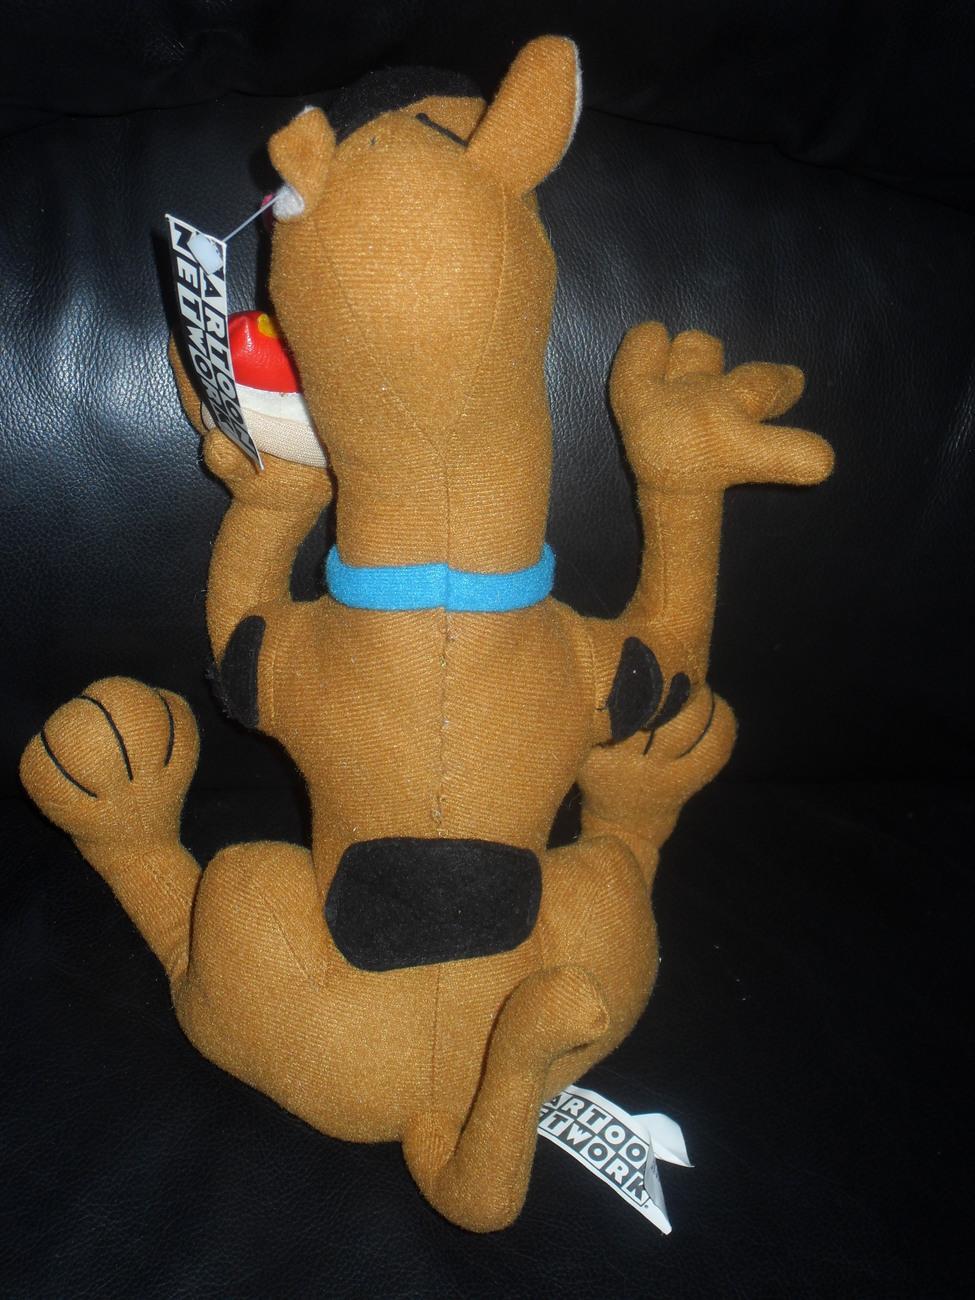 1998 Hanna-Barbera Scooby Doo With Vinyl Hotdog 12 Inch Stuffed Toy